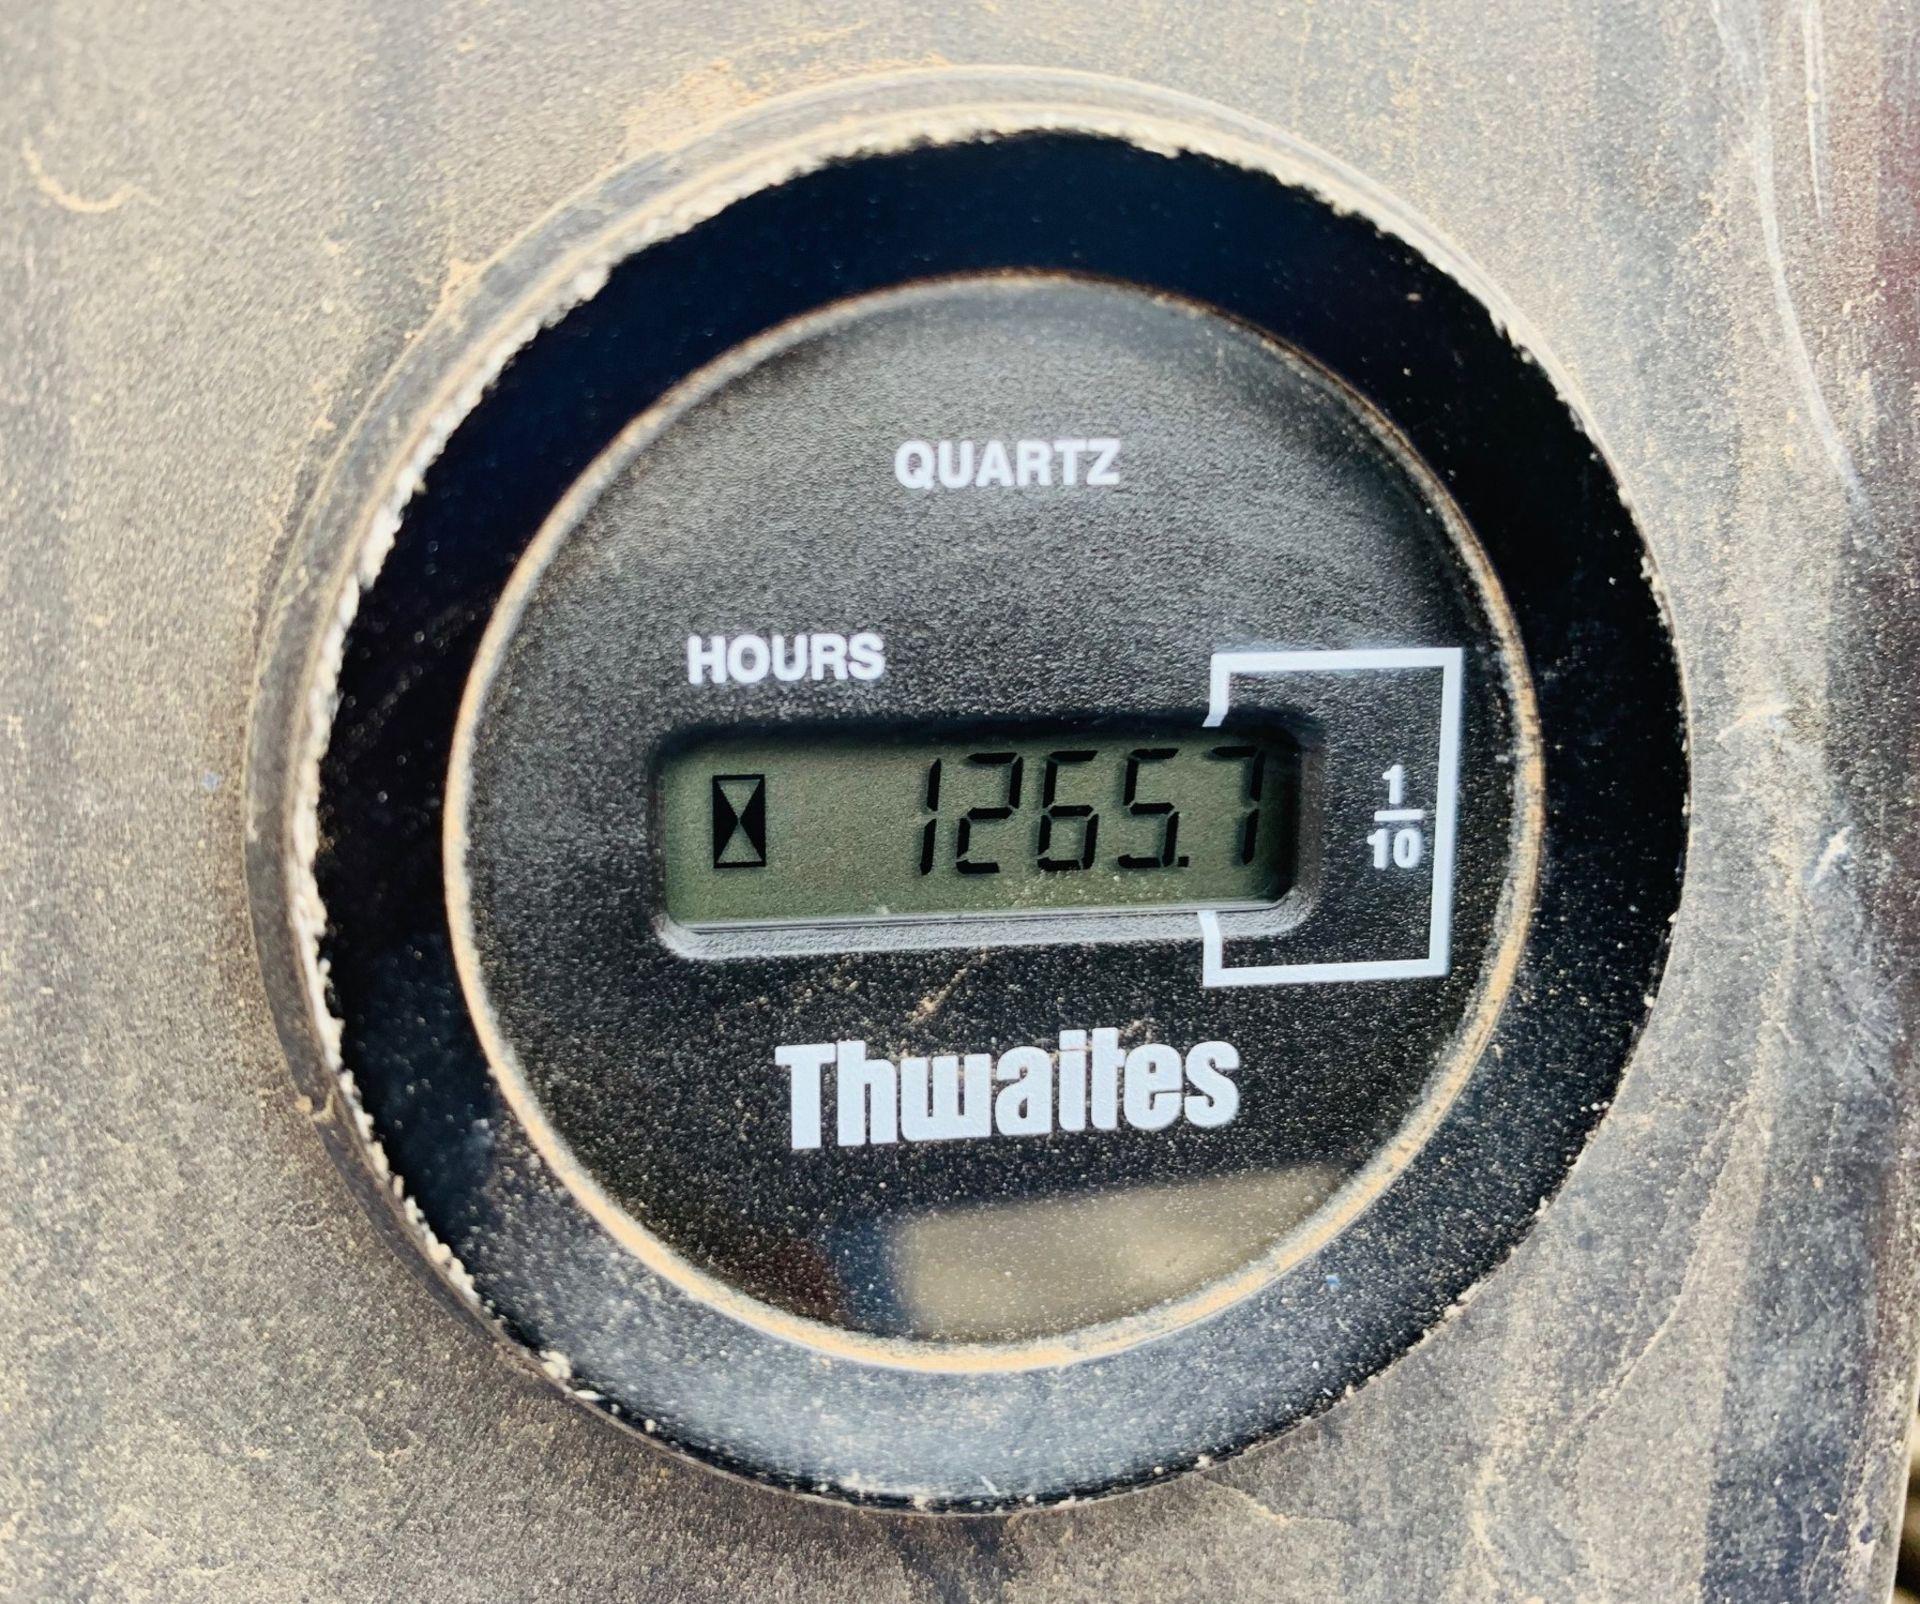 Lot 60 - THWAITES 3 TONNE SWIVEL TIP DUMPER, YEAR 2010, 1265 HOURS, GOOD TYRES, CE MARKED *PLUS VAT*